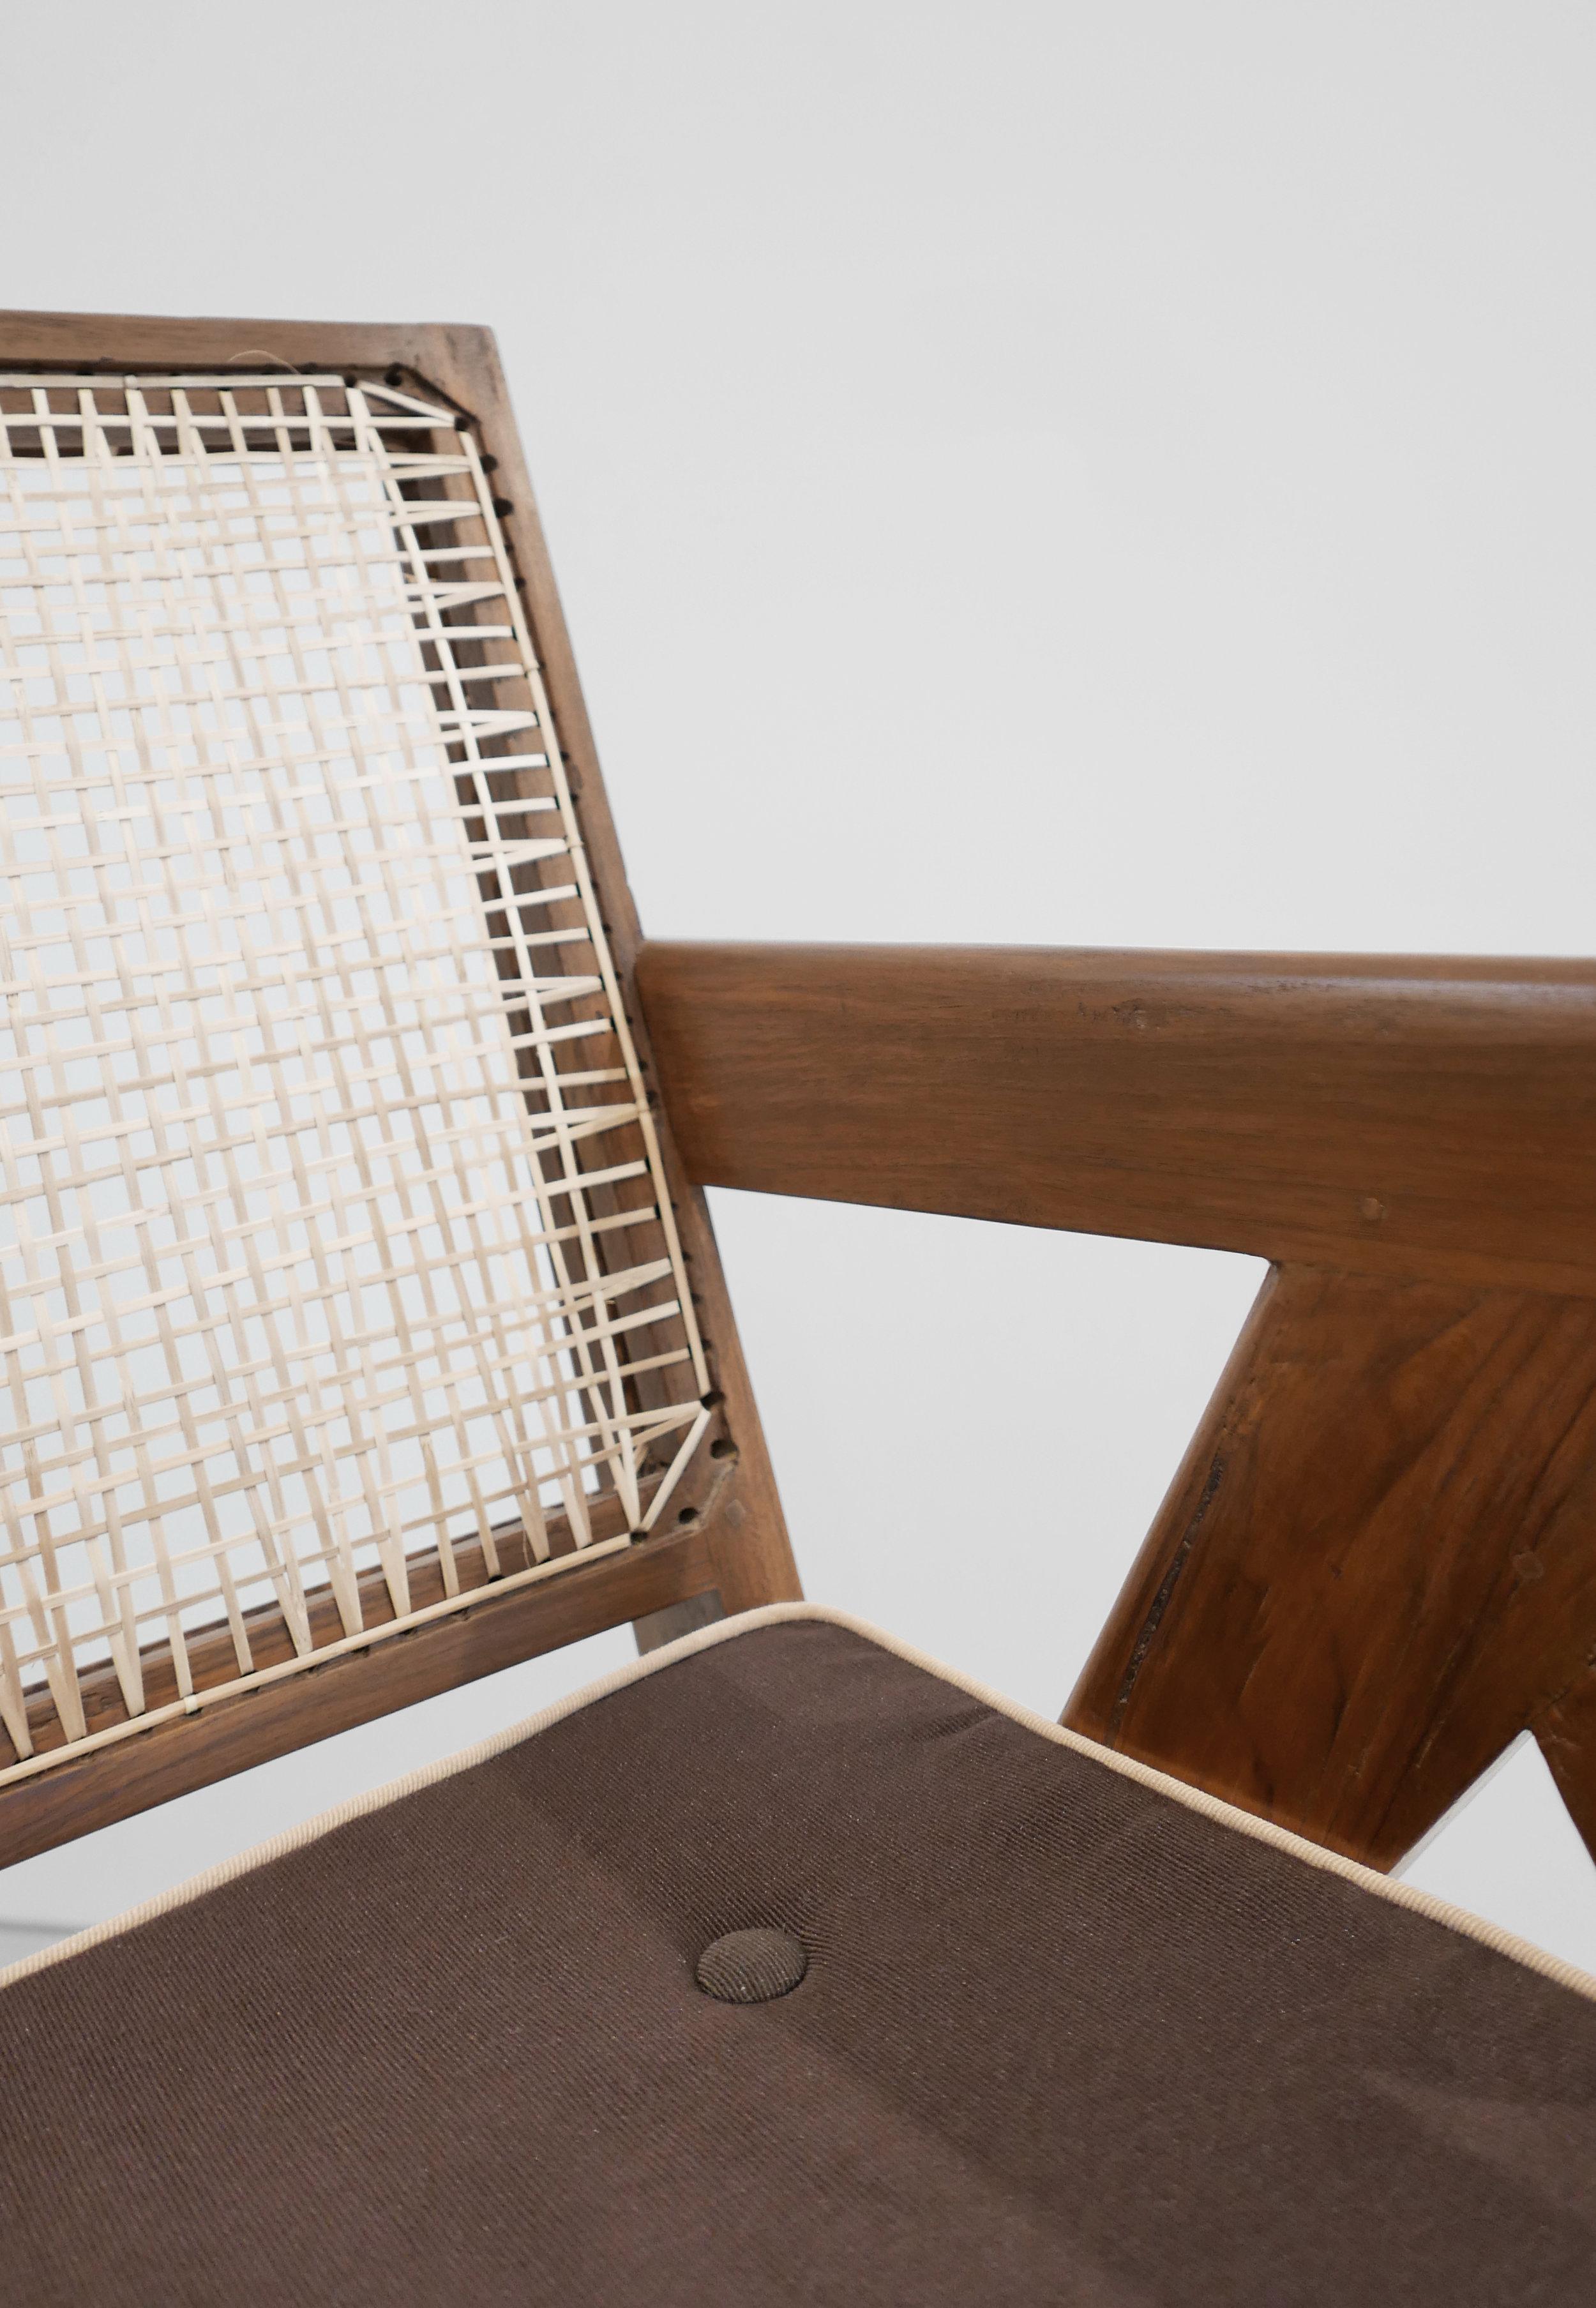 Pierre Jeanneret, Low lounge chair, model PJ-SI-29-A, c. 1955, teak, cane, 24.5H x 20.5W x 29.5D inches_7.jpg